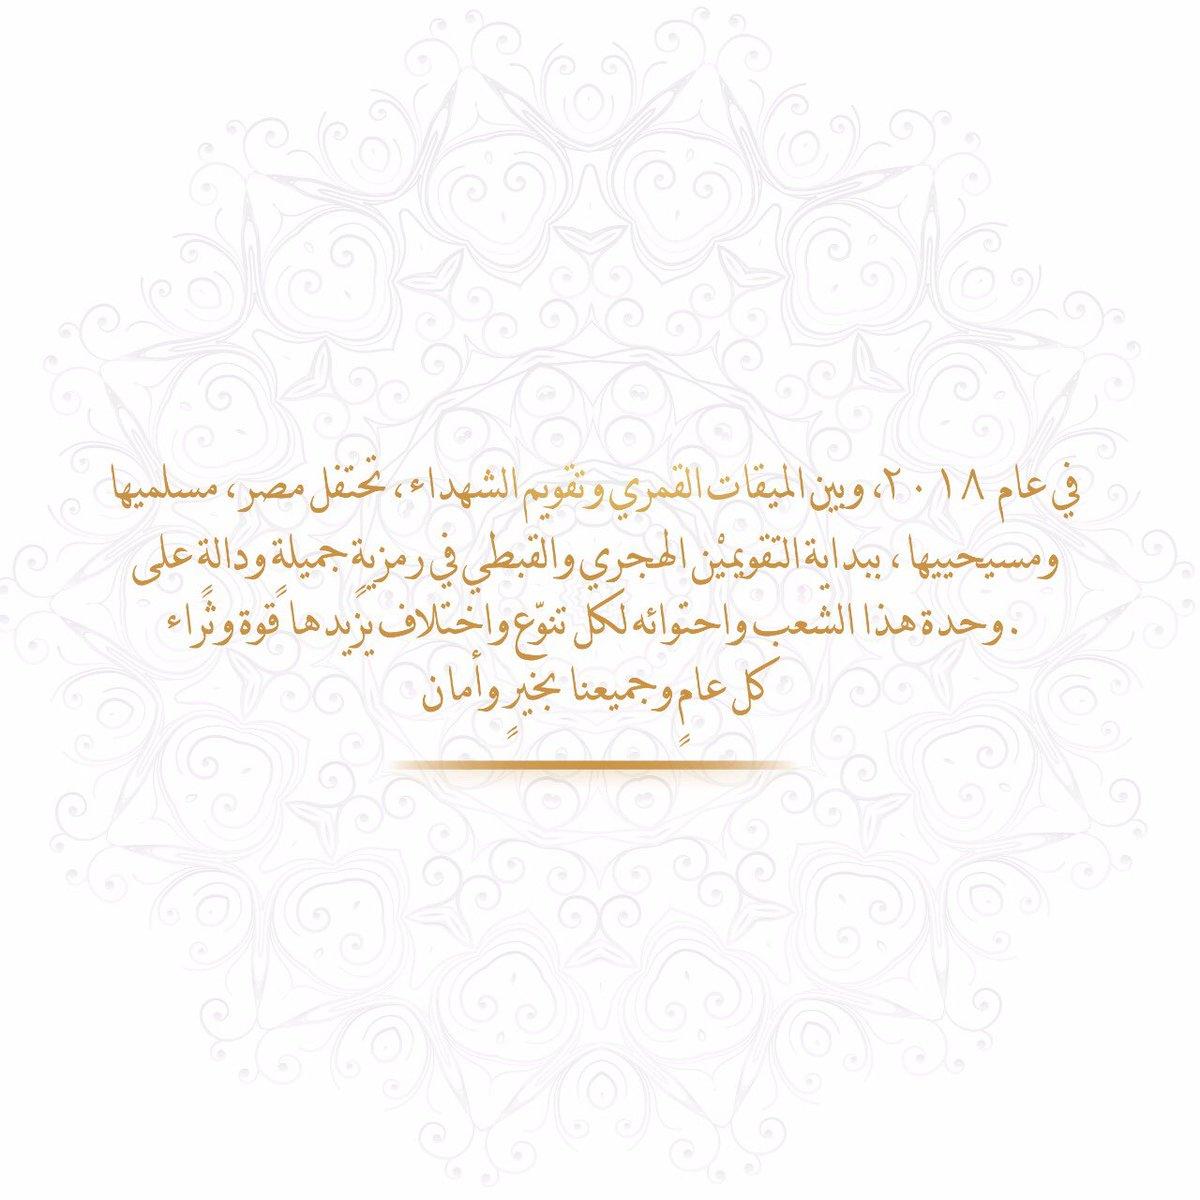 Abdelfattah Elsisi (@AlsisiOfficial) on Twitter photo 2018-09-11 08:34:24